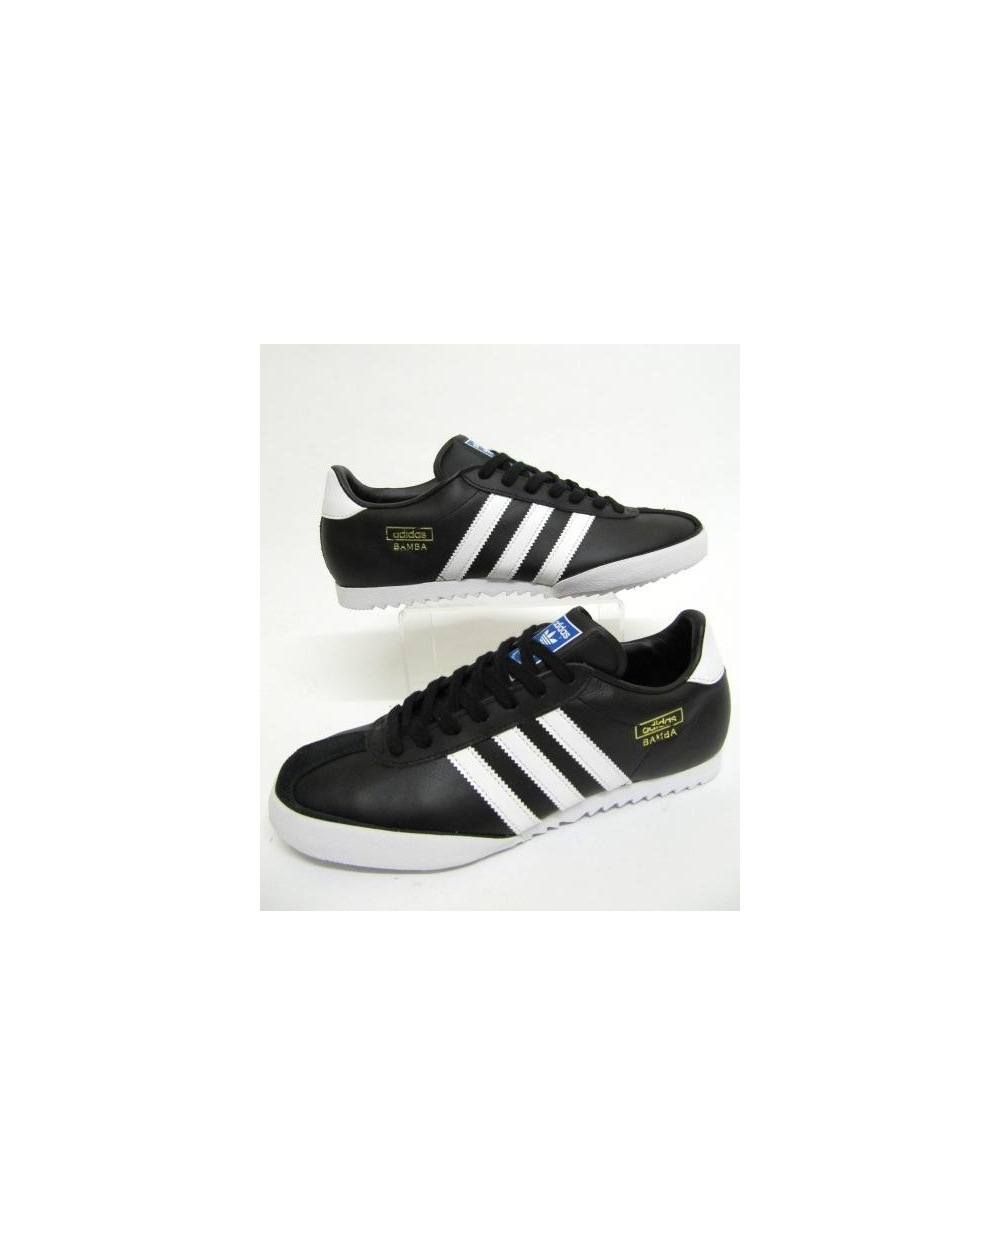 a9c953eae0d9f Adidas Bamba Trainers Black/white, originals, adidas bamba black ...